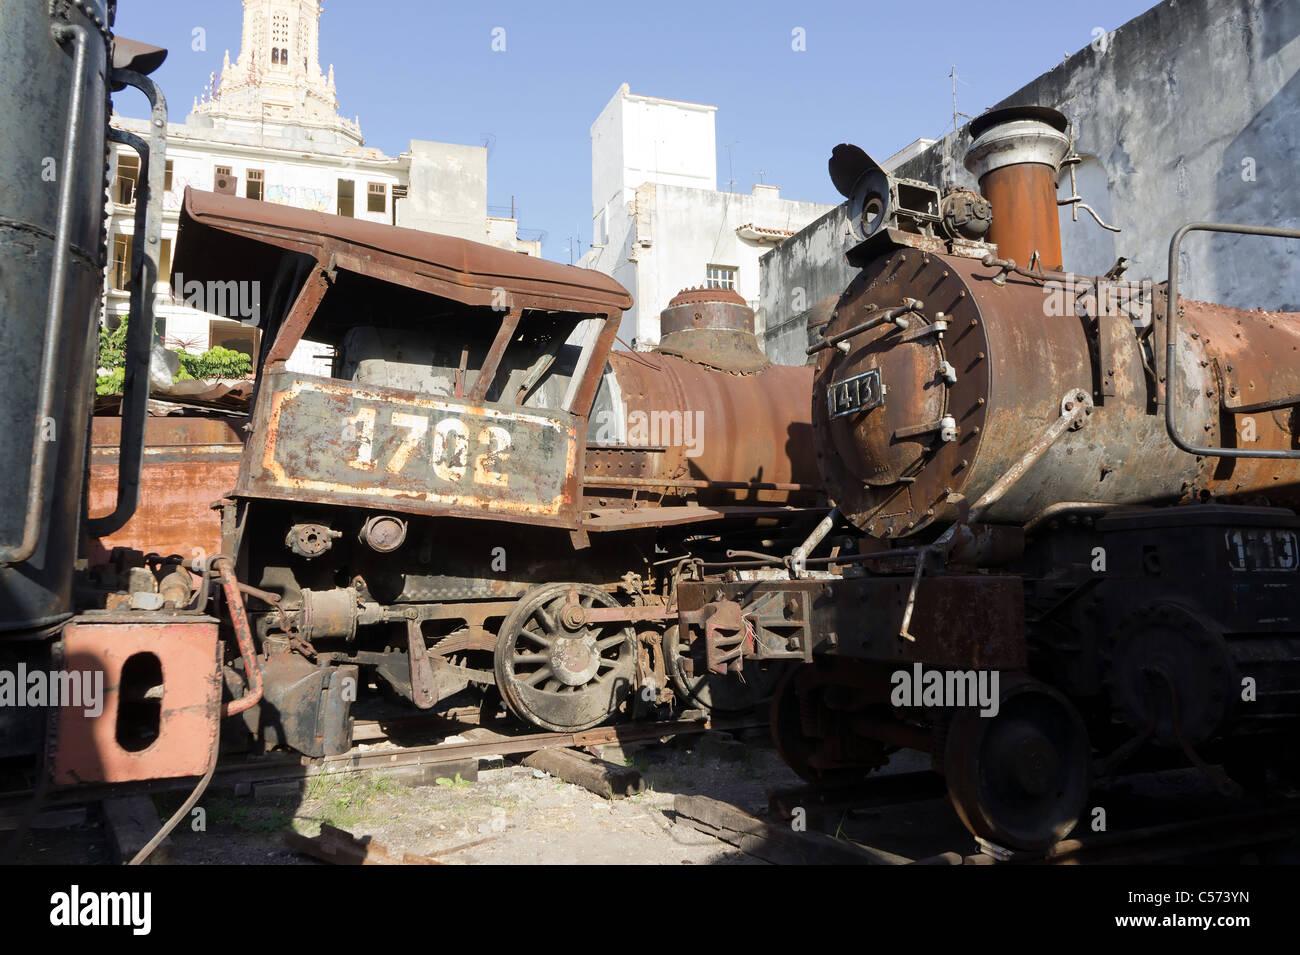 Rusty steam locomotives awaiting restoration, Havana, Cuba - Stock Image